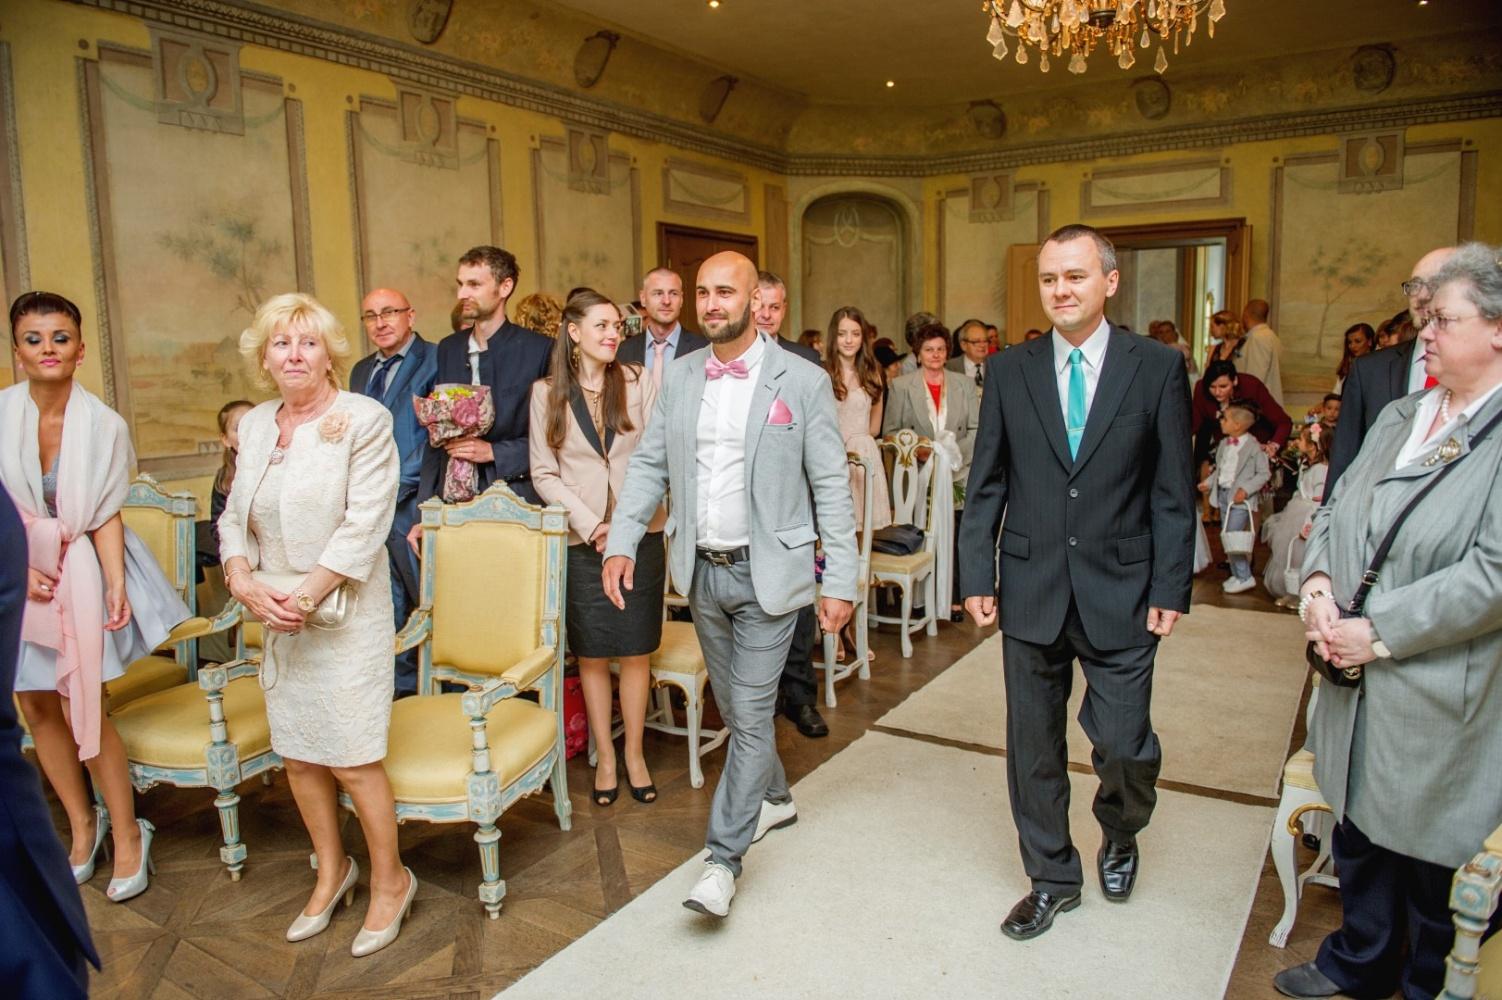 http://www.fotoz.sk/images/gallery-26/normal/svadba_hotel-chateau-bela_066.jpg